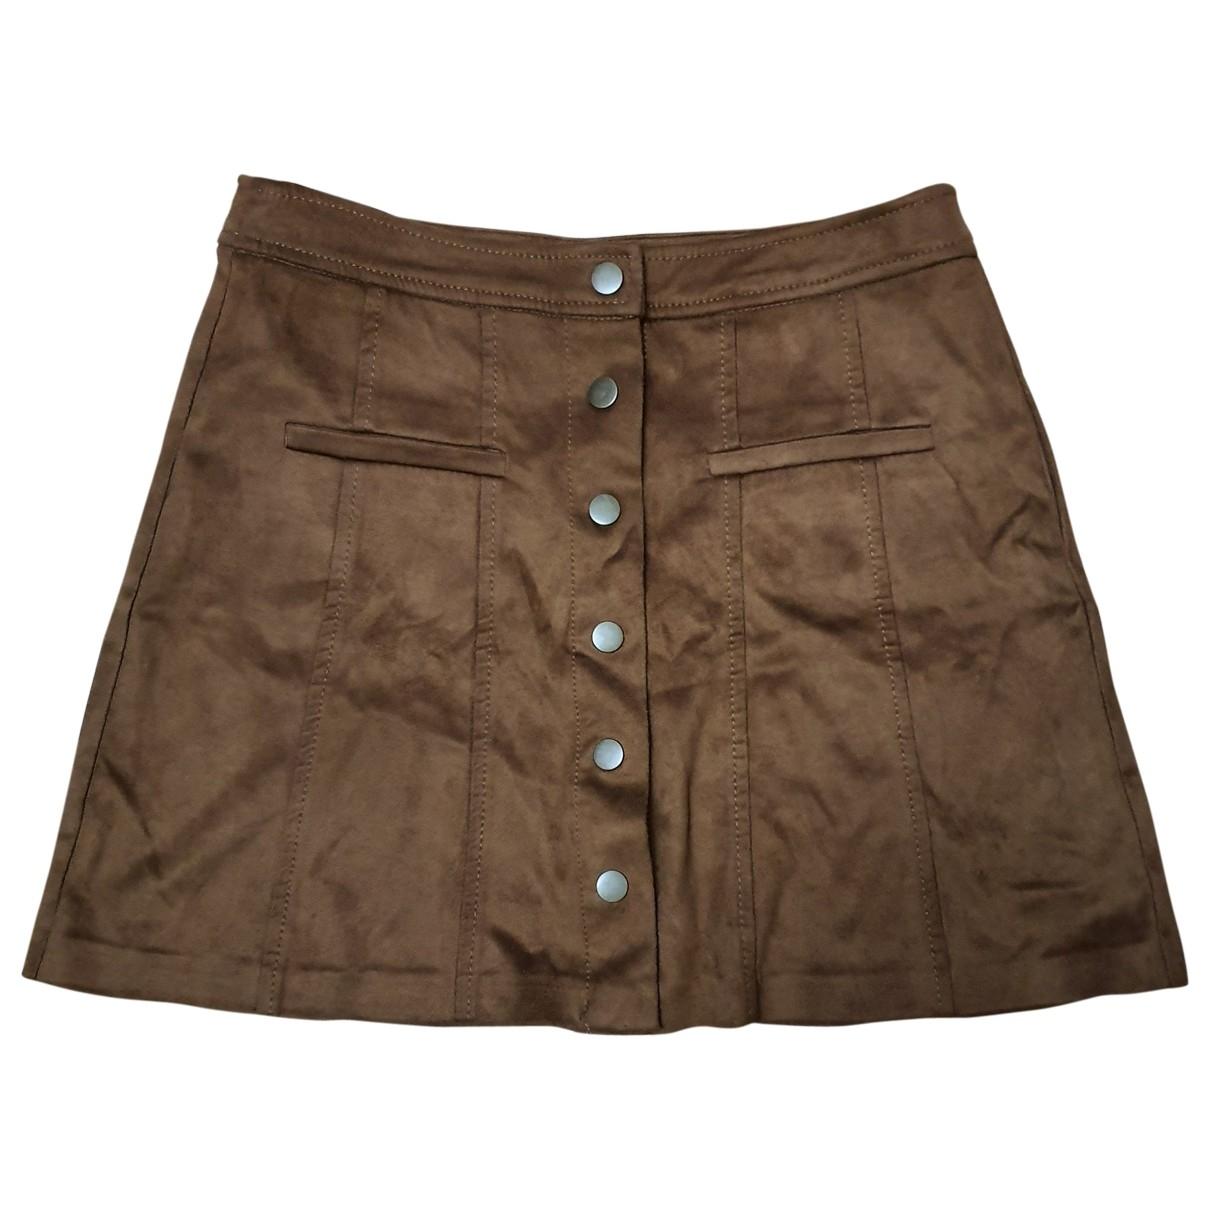 Zara - Jupe   pour femme - marron